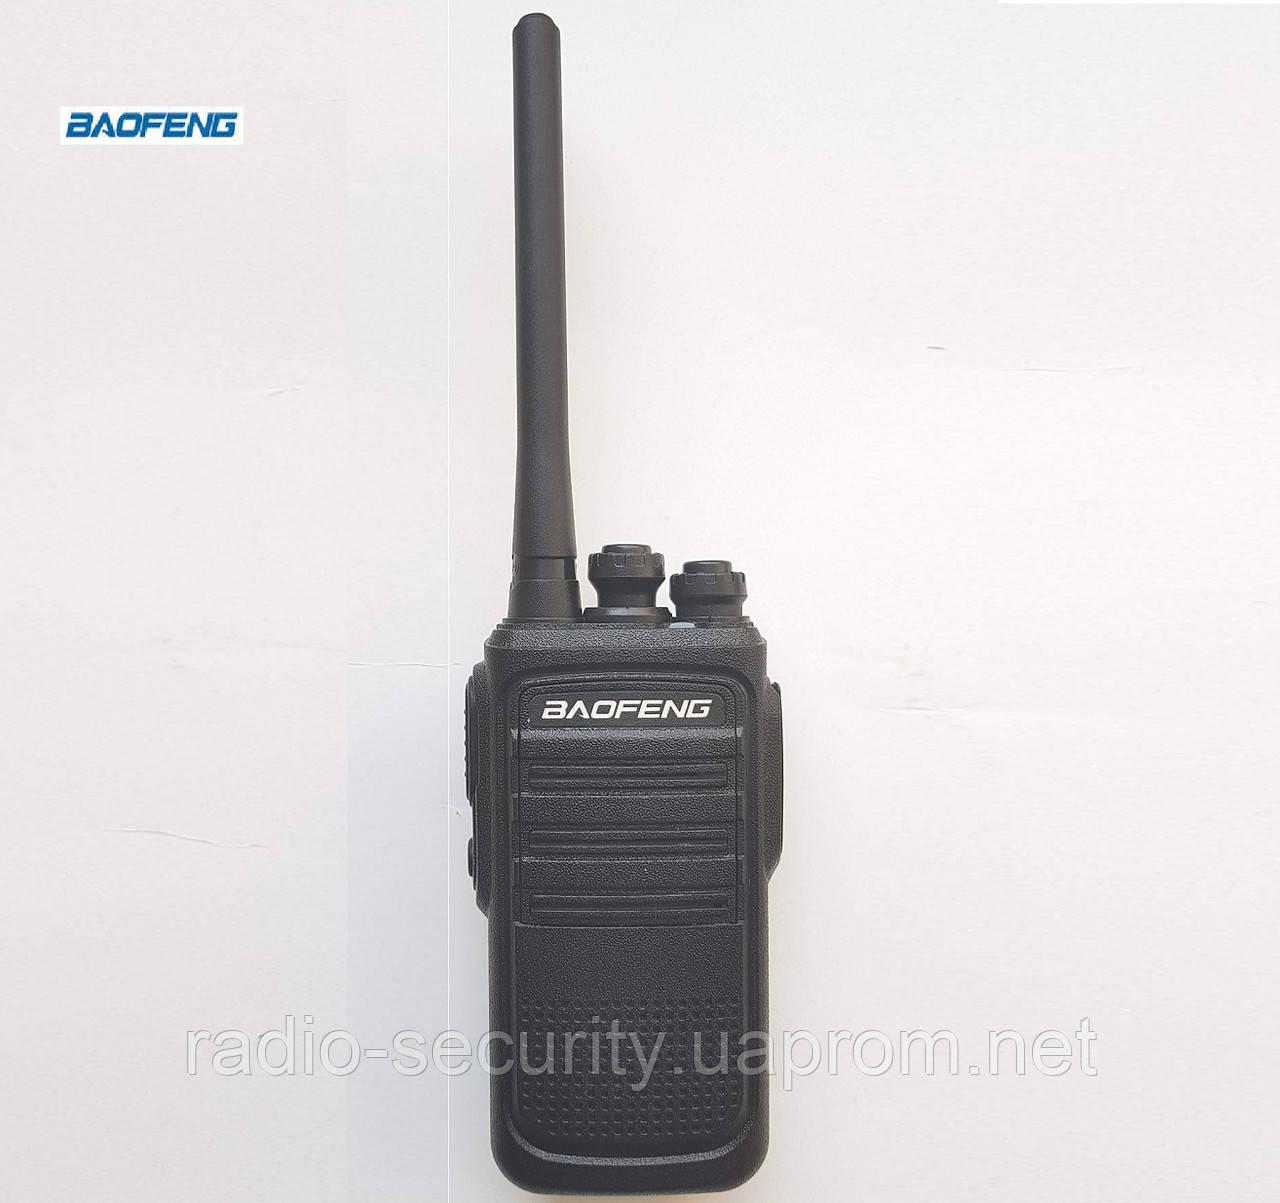 Радиостанция портативная BAOFENG BF-N8 UHF